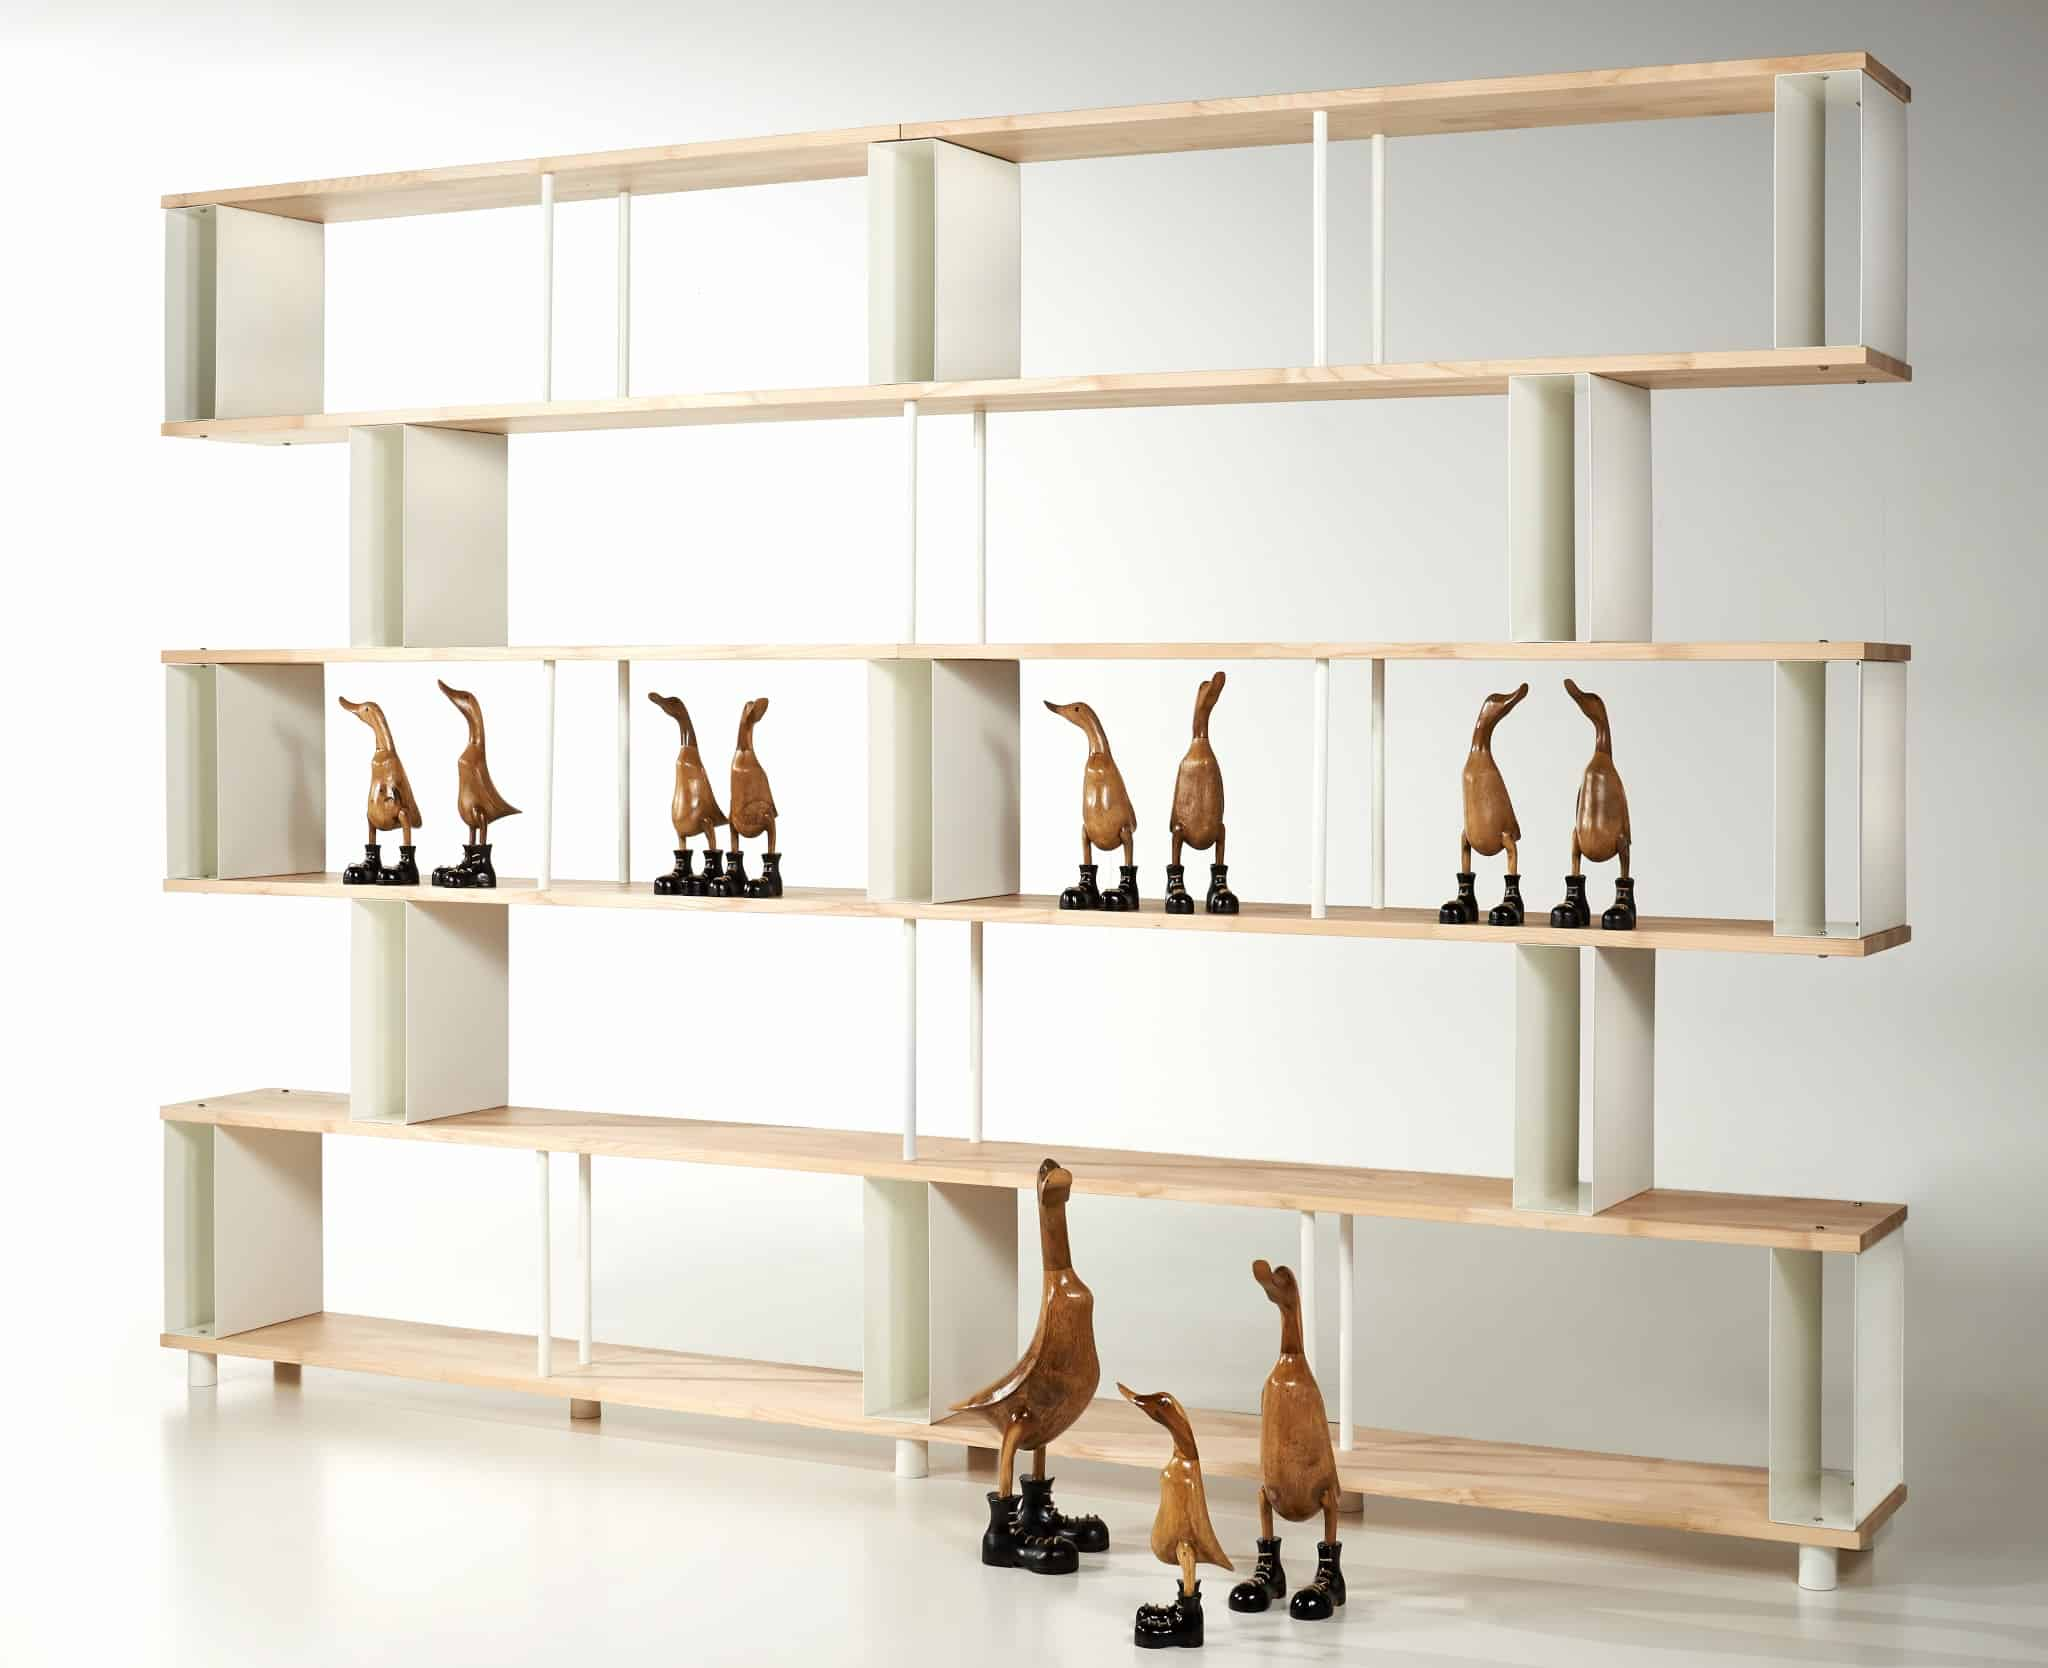 Skaffa Wood Random By Piarotto: New Modular Bookcase Promotes Open Atmosphere